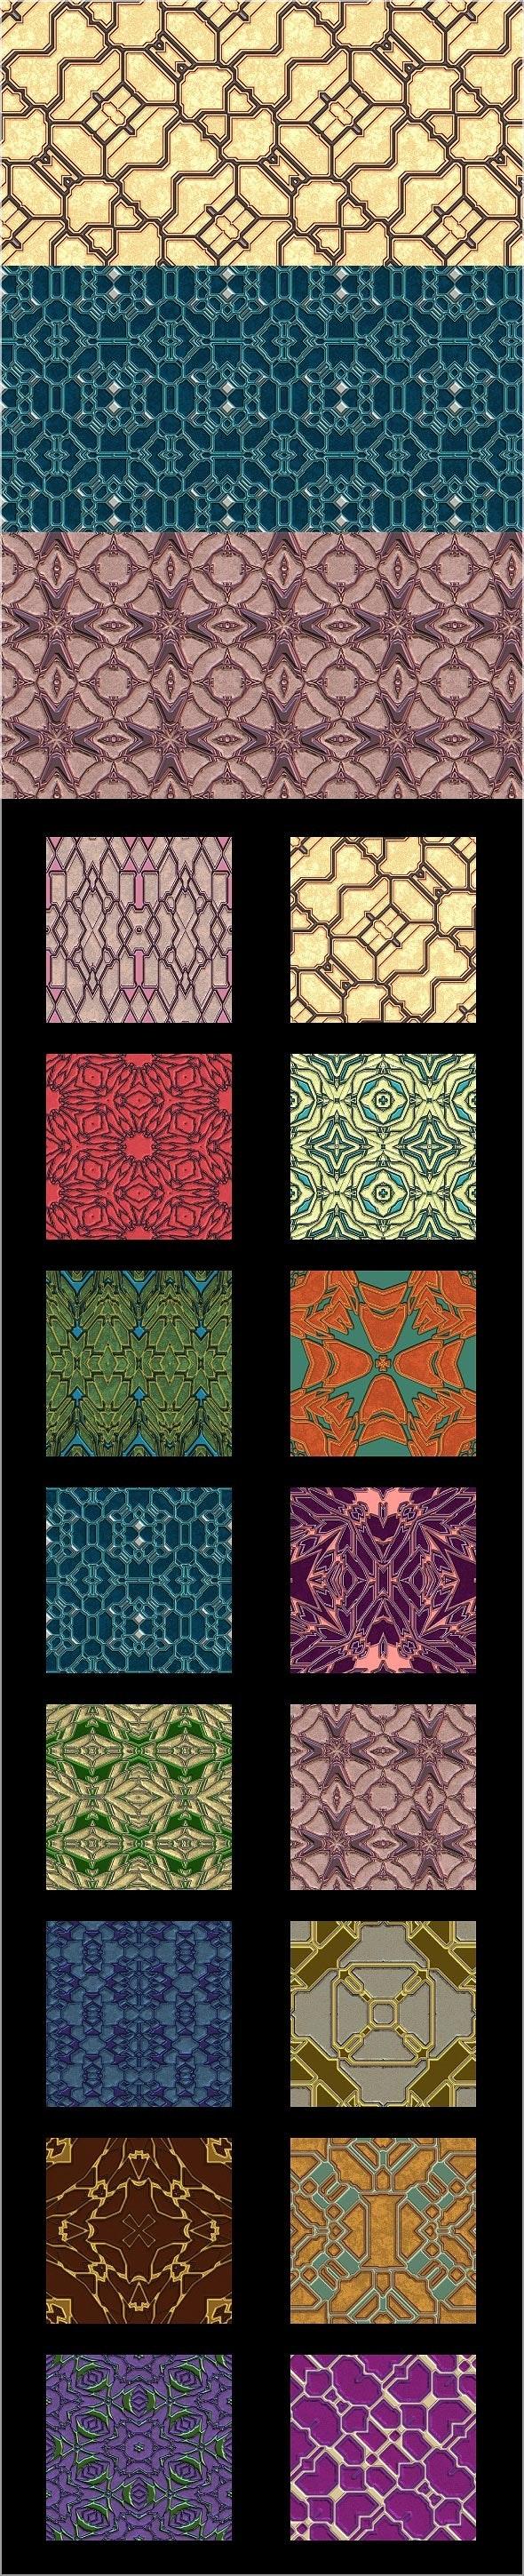 Alien Designer Walls - Pattern Pack - Techno / Futuristic Textures / Fills / Patterns